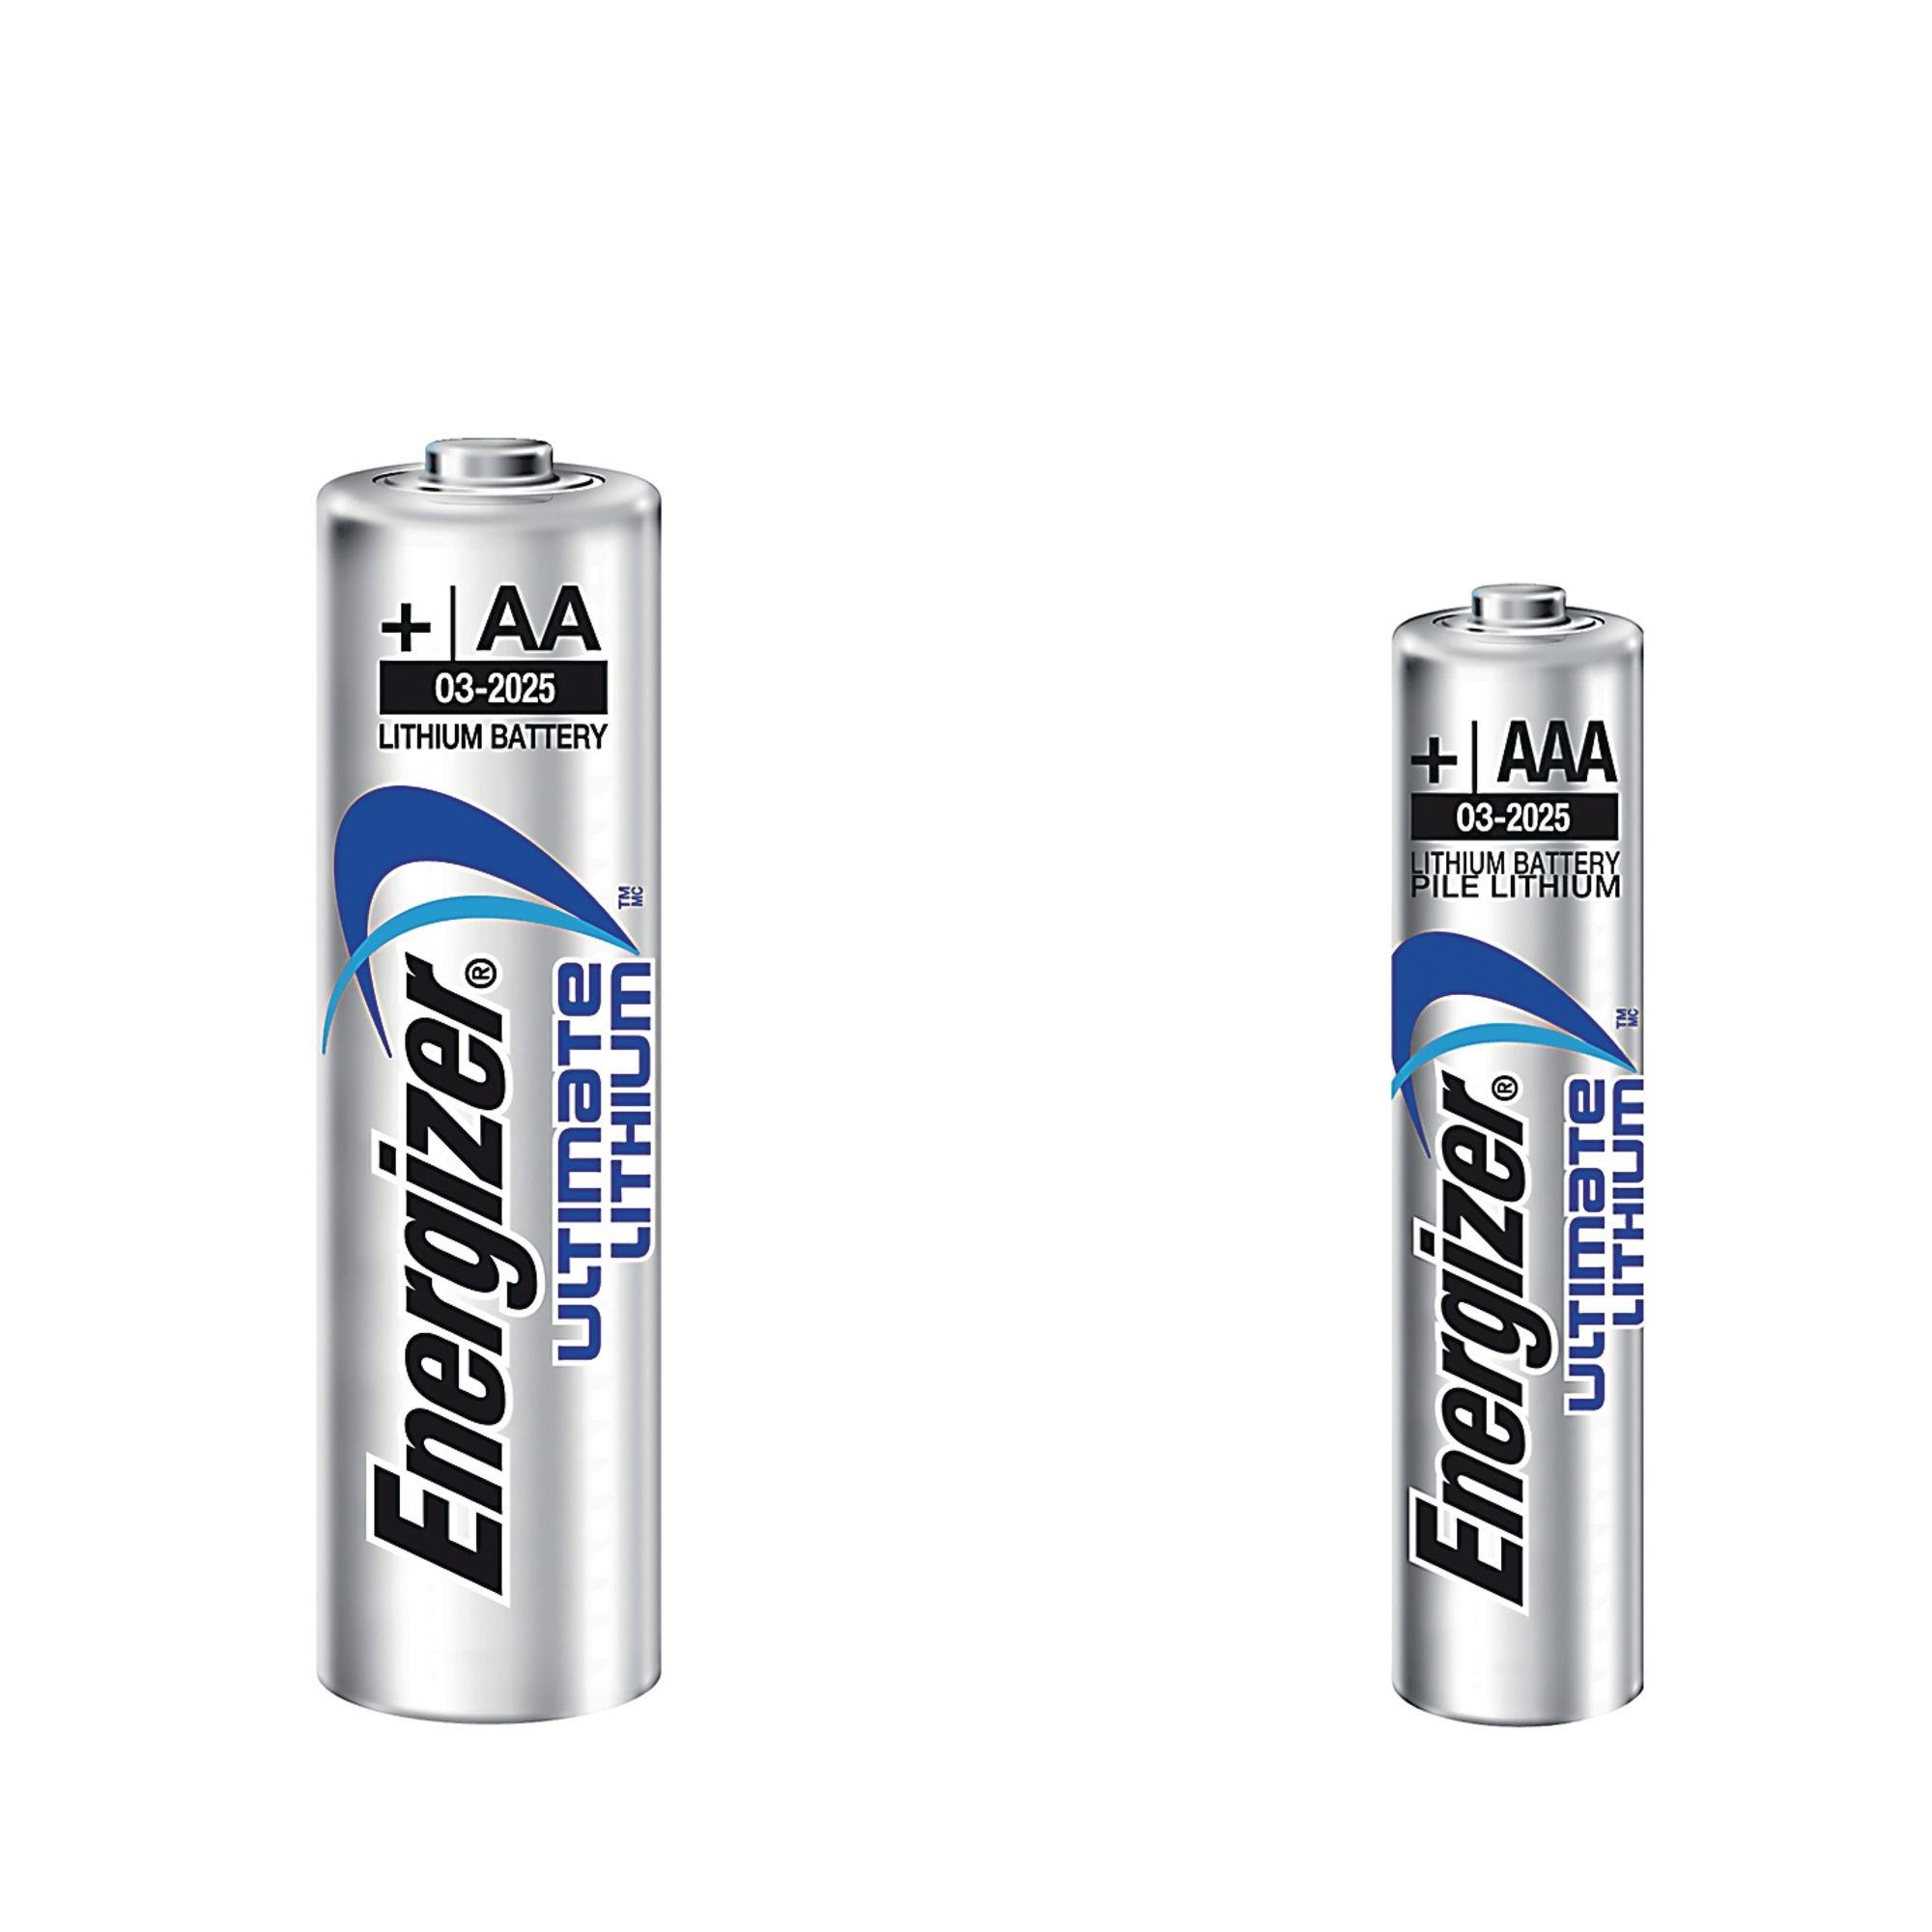 Lithium Batteries AA LR6 P4